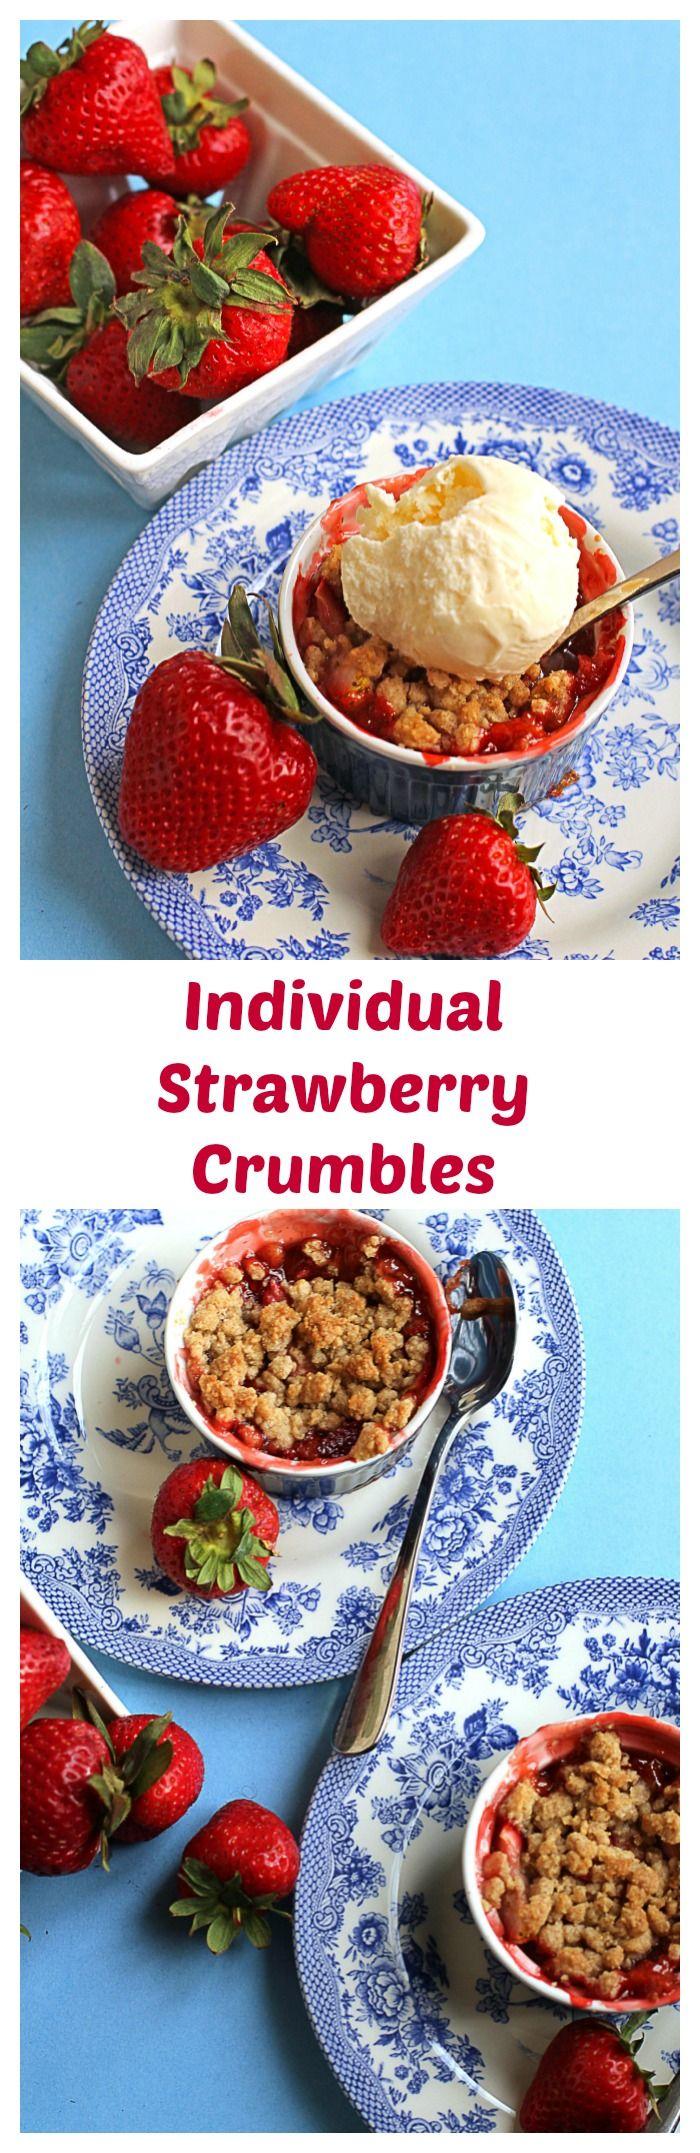 Individual Strawberry Crumbles | Grandbaby Cakes